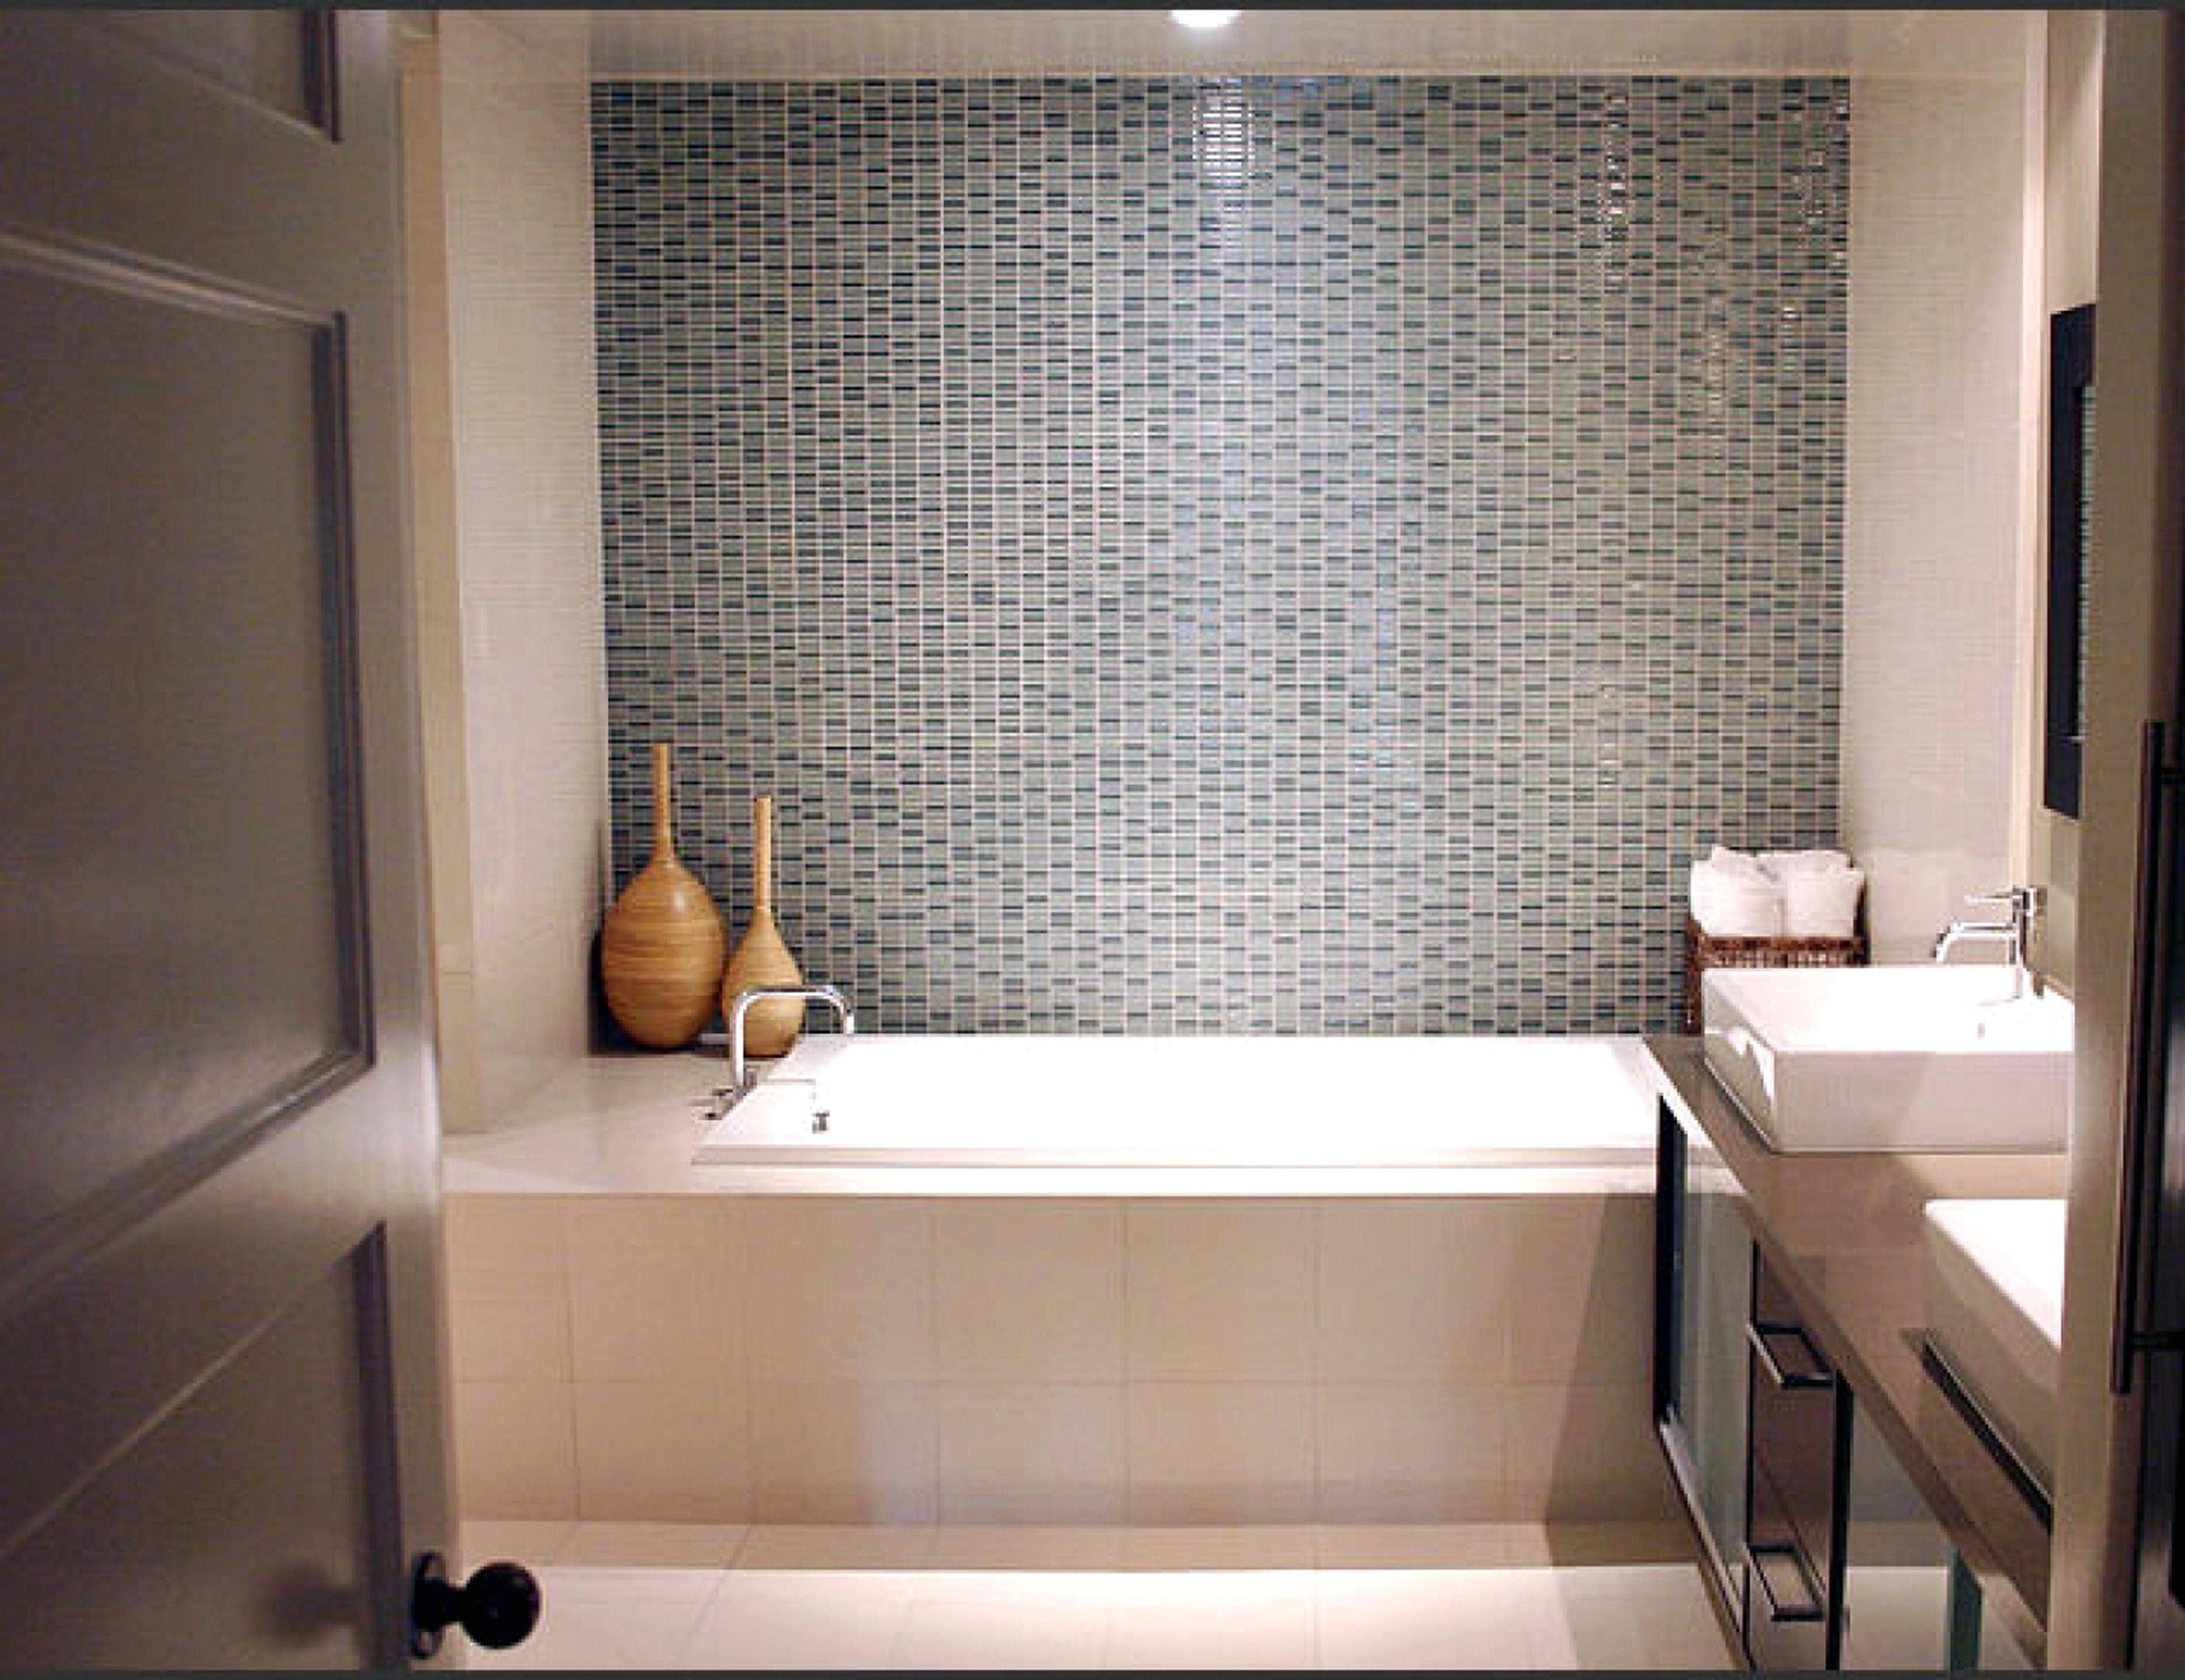 Bathroom Master Decorating Ideas Pinterest Craft Room More Paint Blues Blue Bathrooms  Decor Coastal